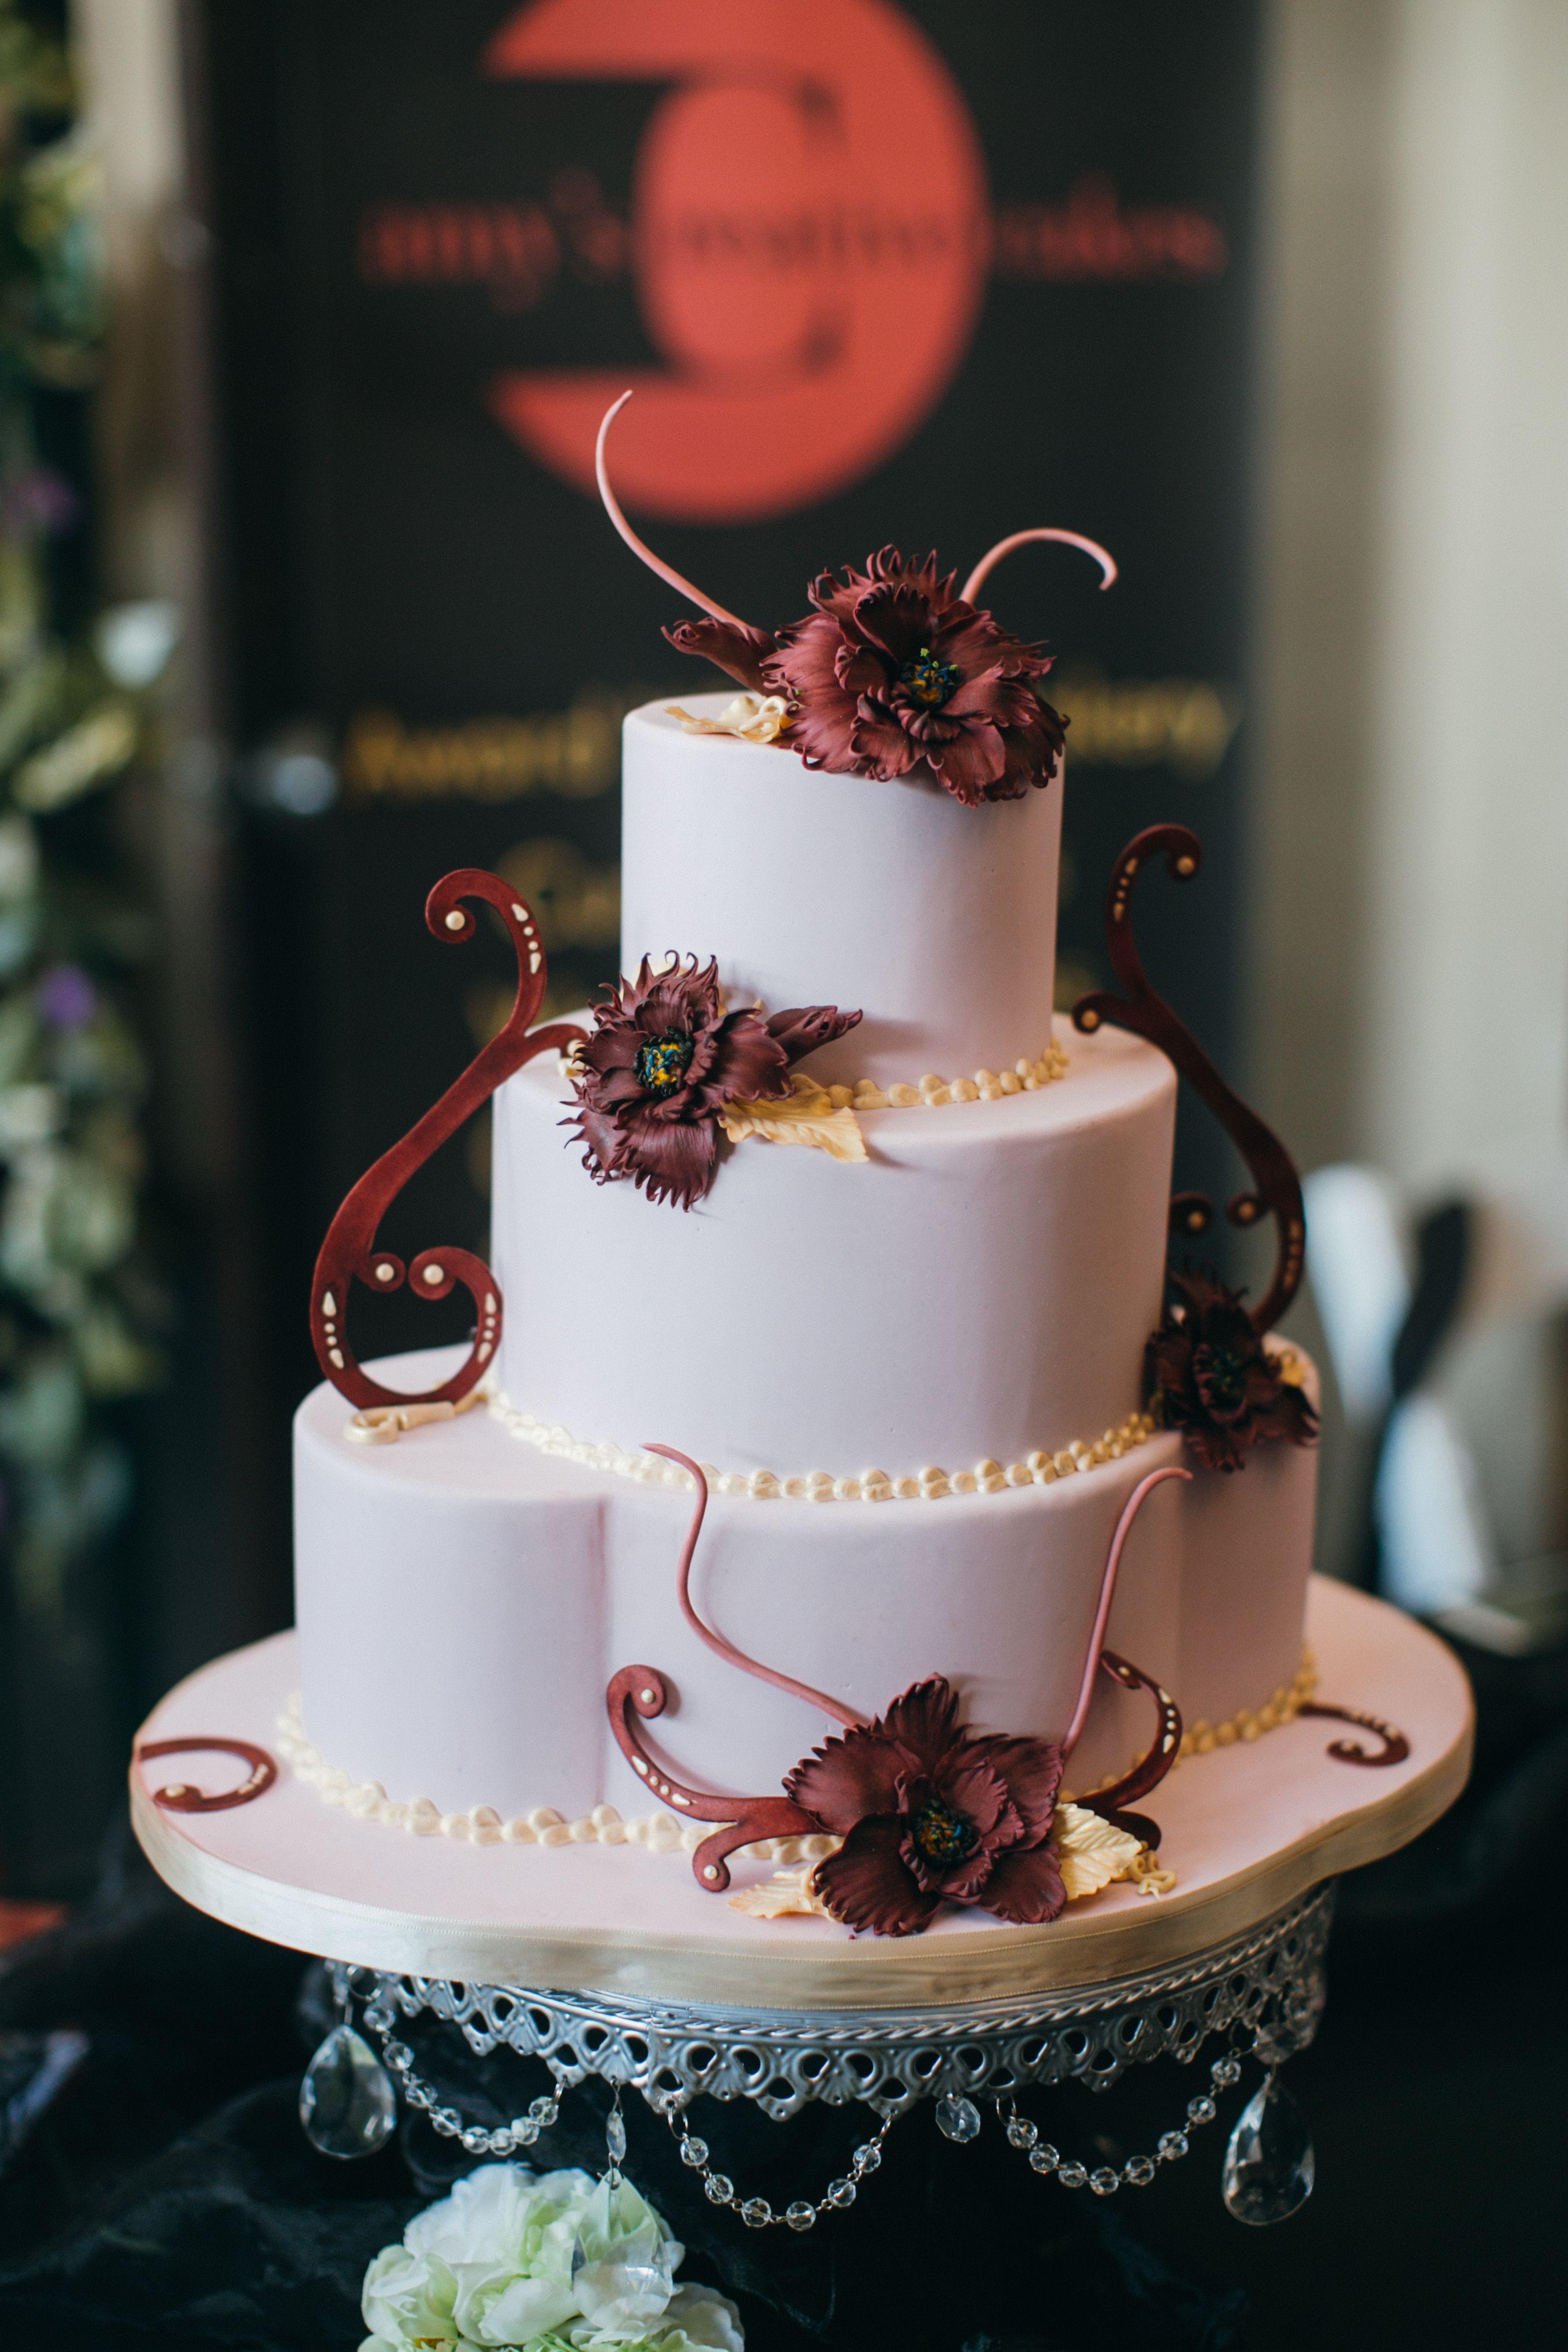 Amys creative cakes a unique vendor at our twisted vines